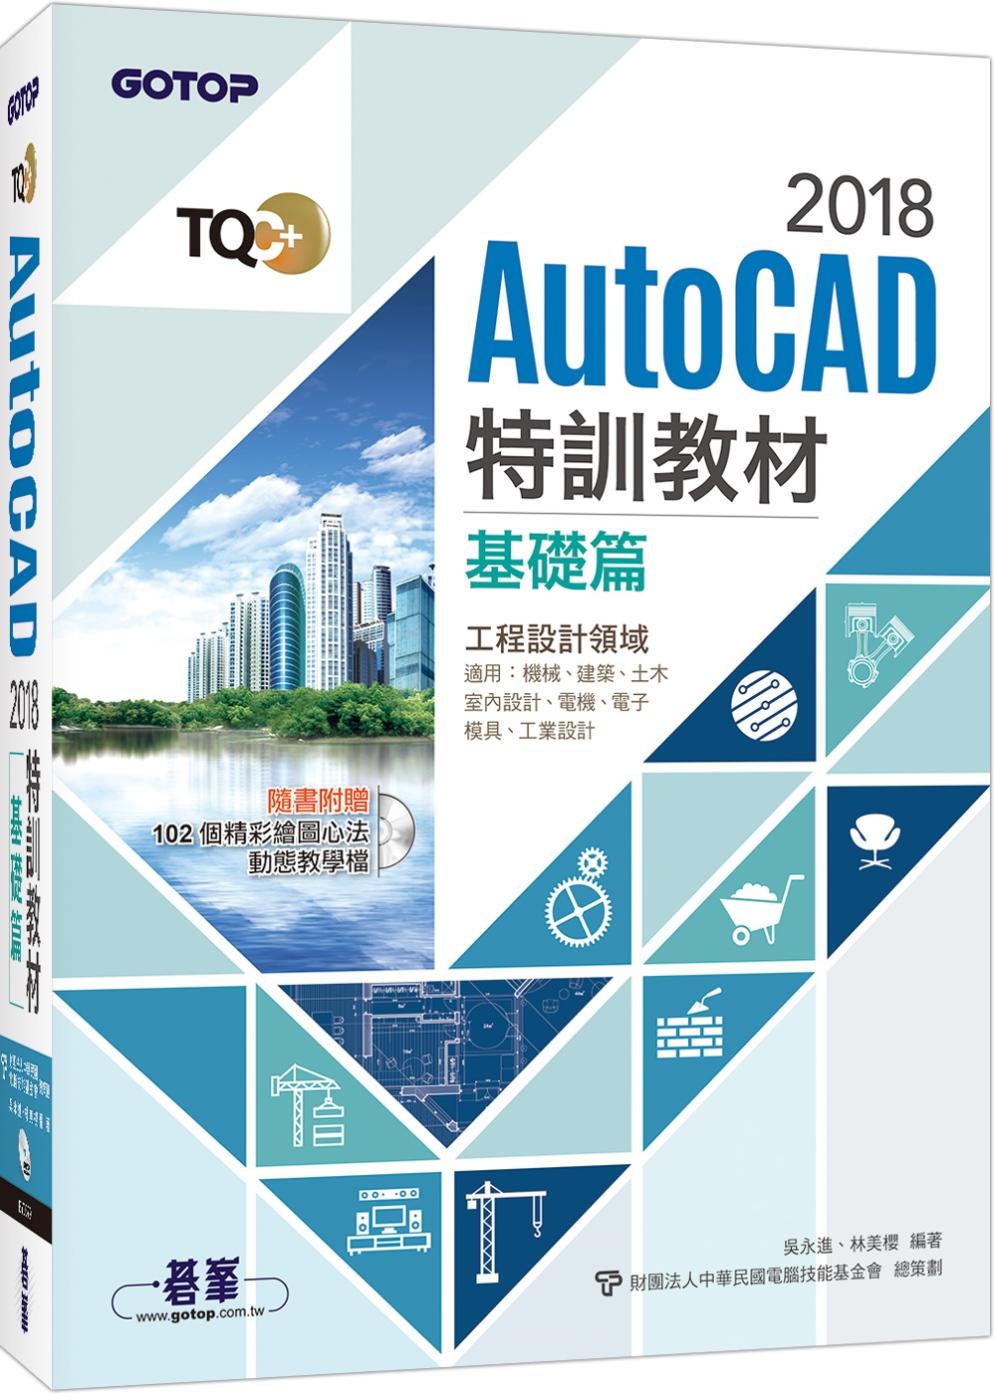 TQC+ AutoCAD 2018特訓教材:基礎篇(隨書附贈102個精彩繪圖心法動態教學檔)